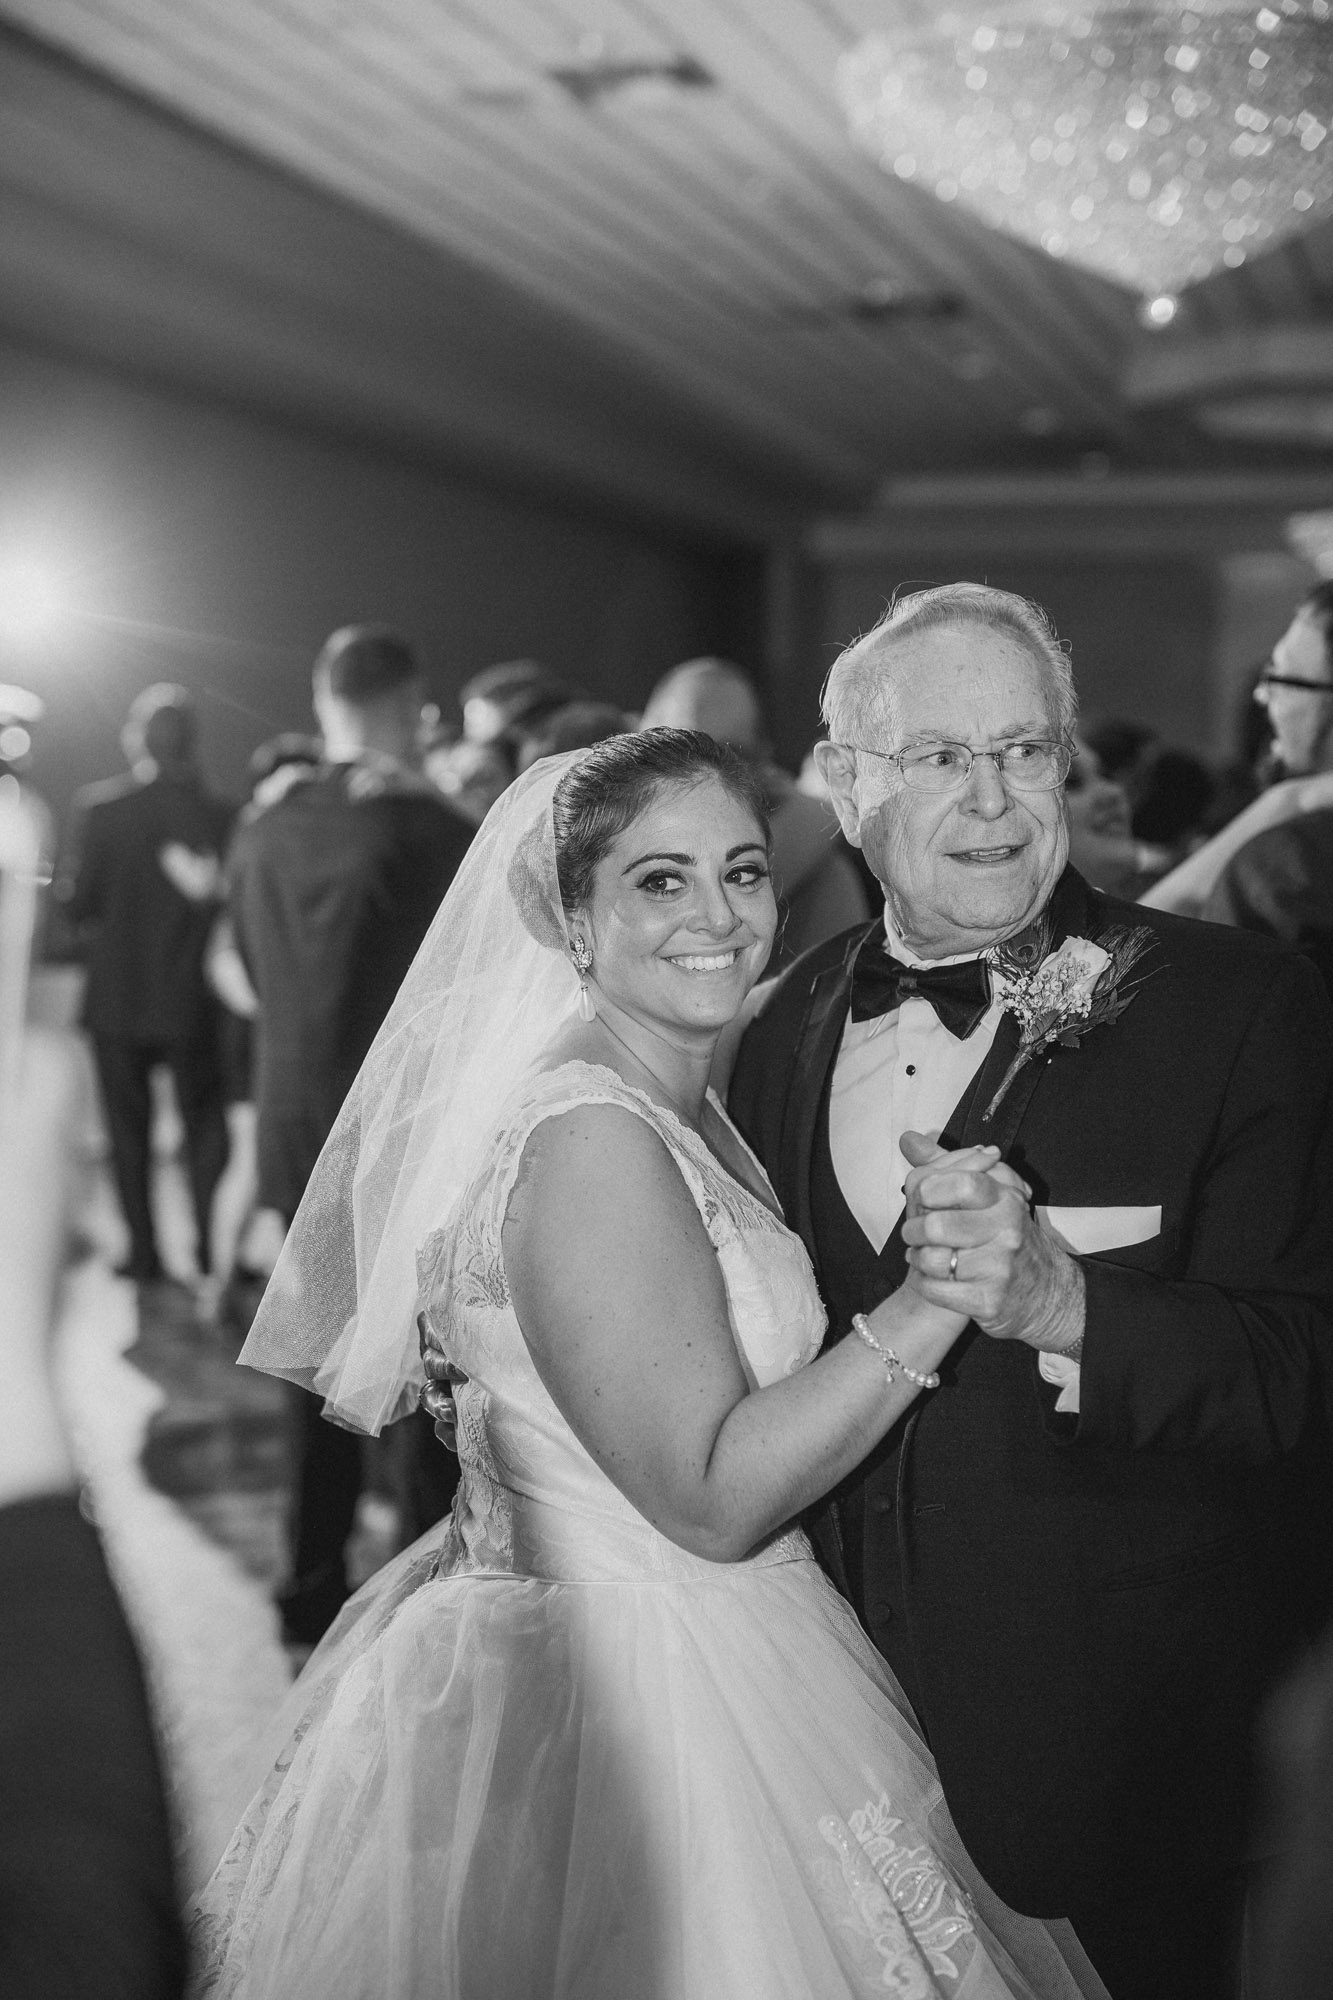 Mike & Danielle's Scranton Wedding Photography 86